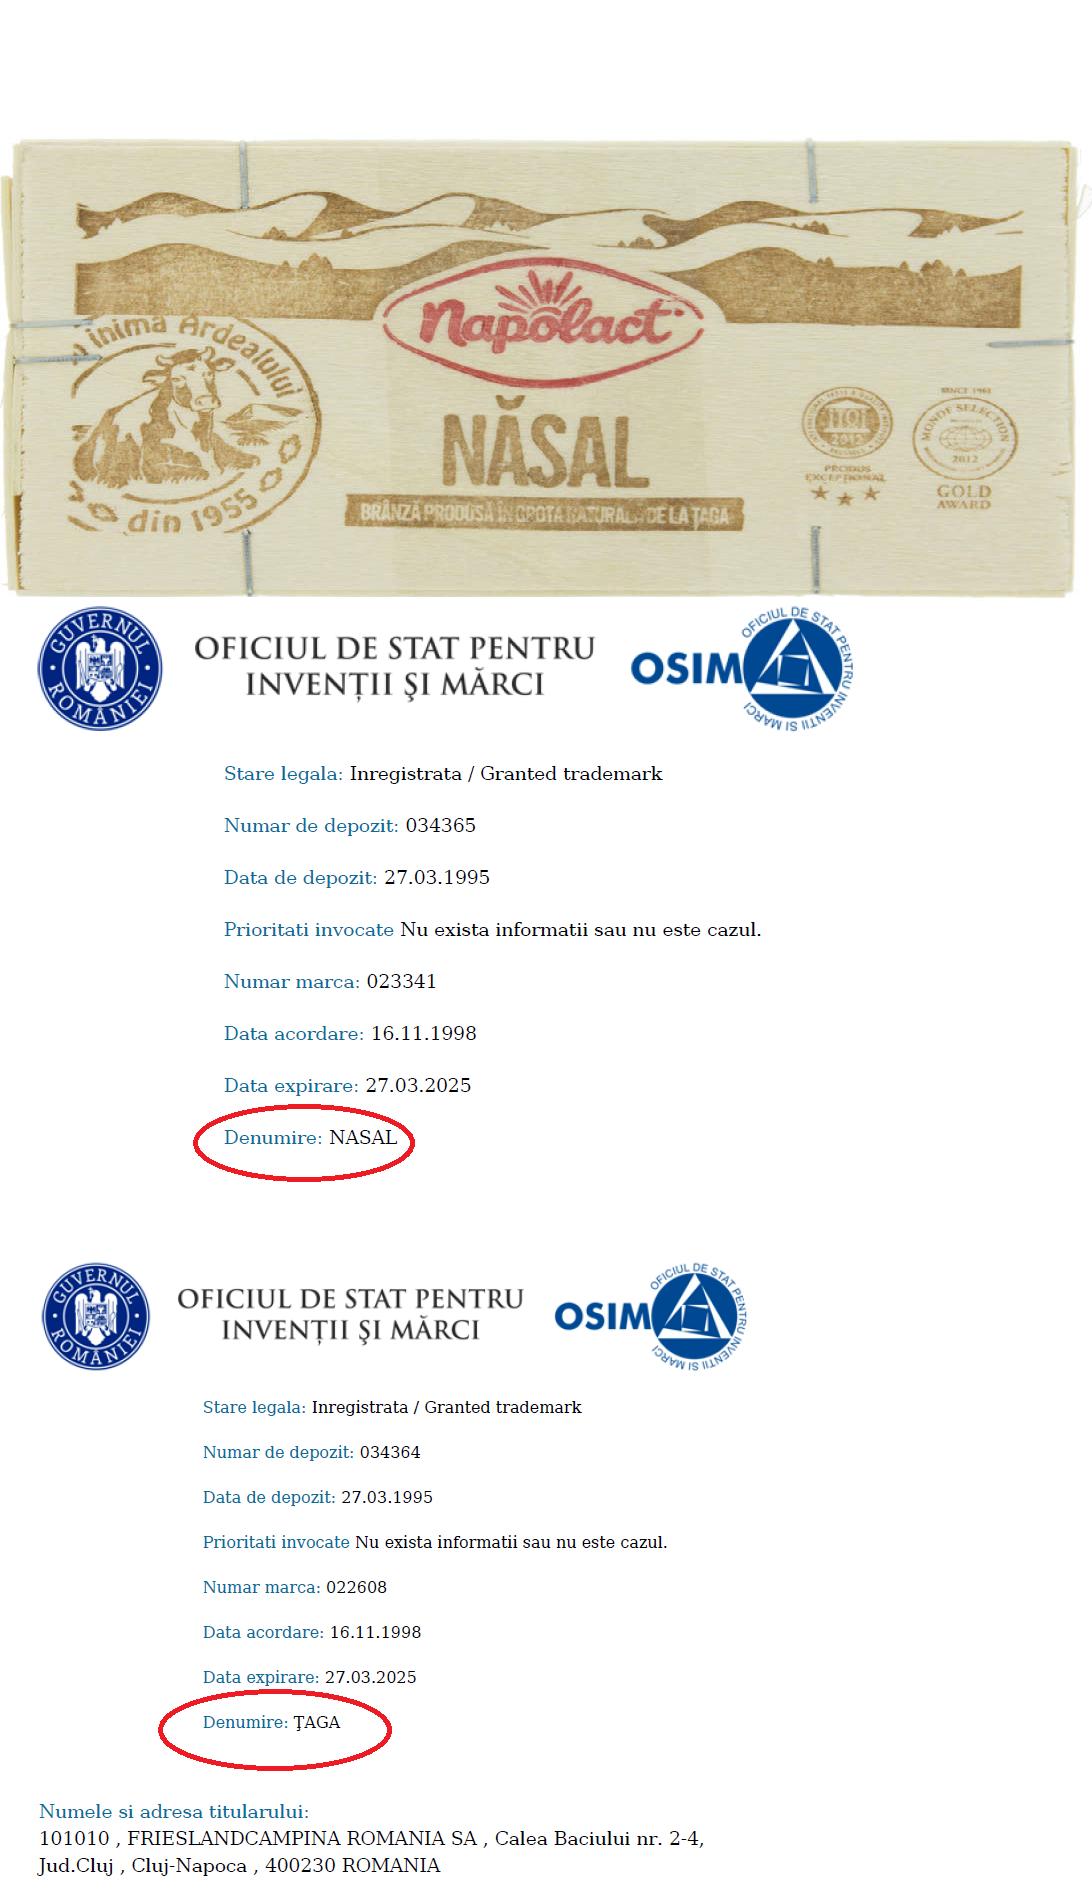 Taga sau Nasal OSIM